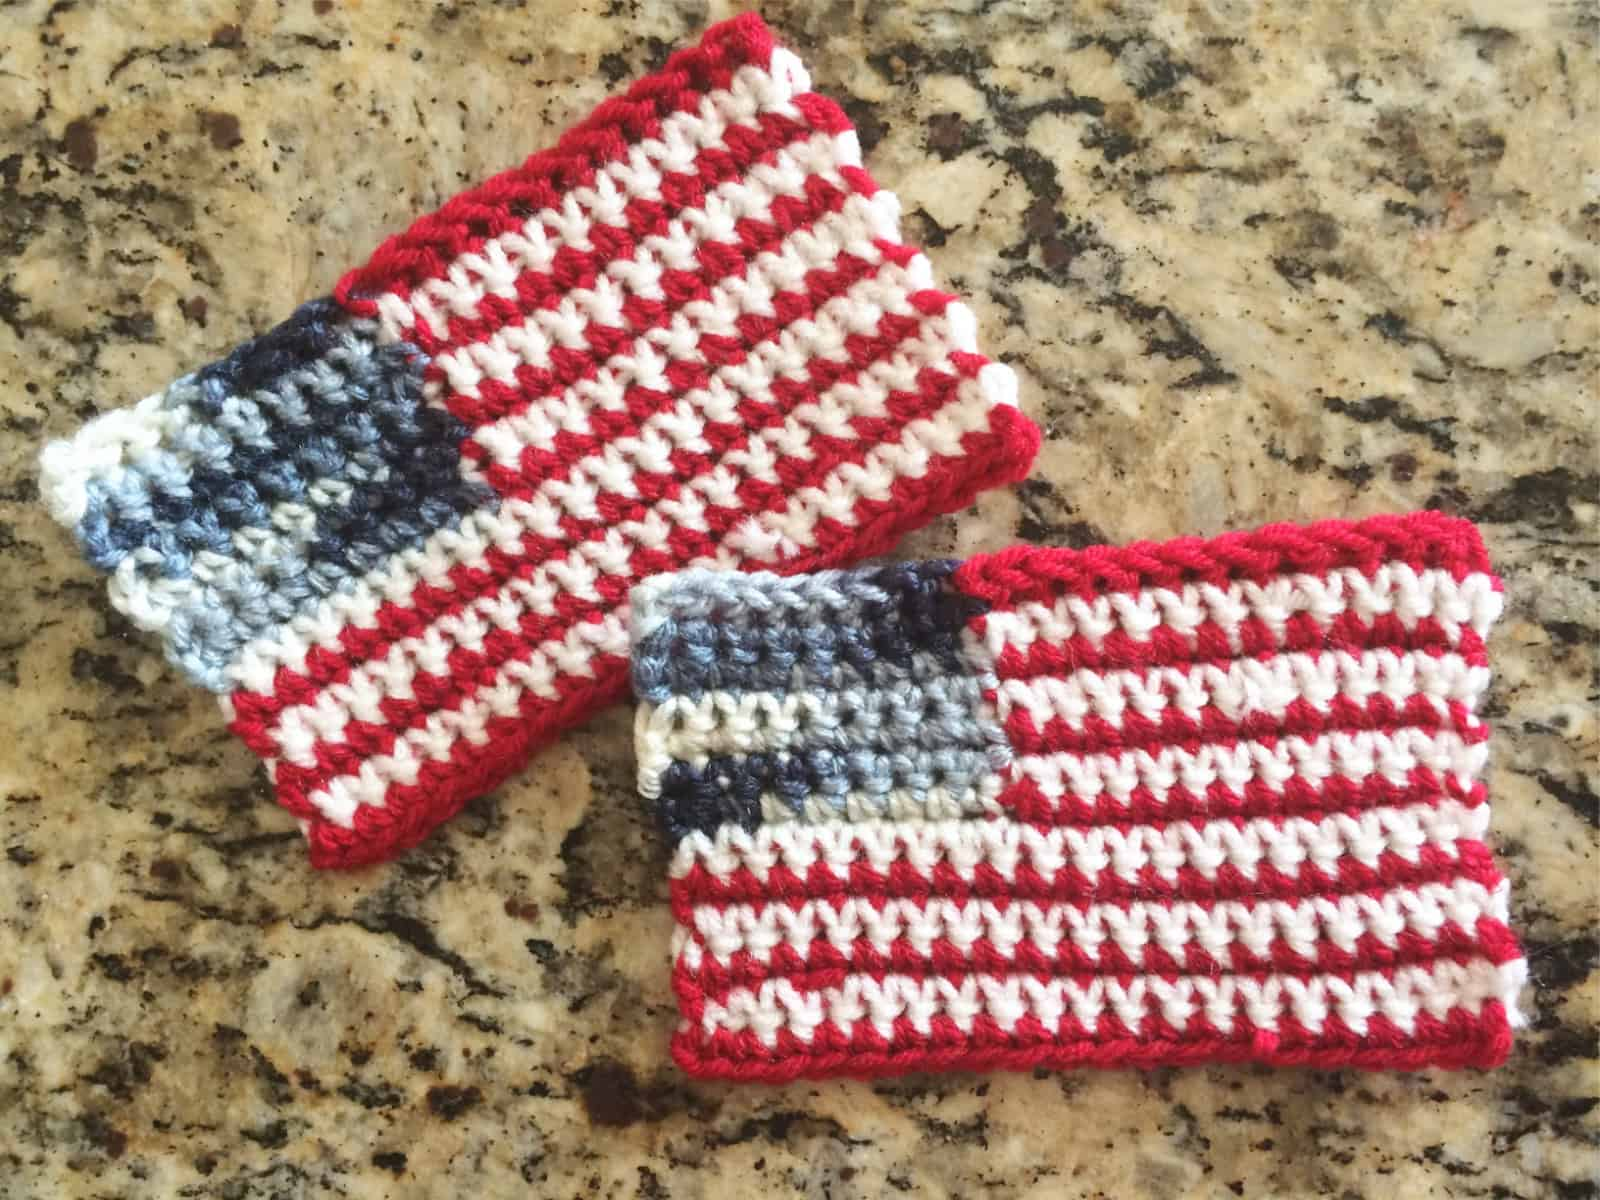 Crochet flag flat after blocking.